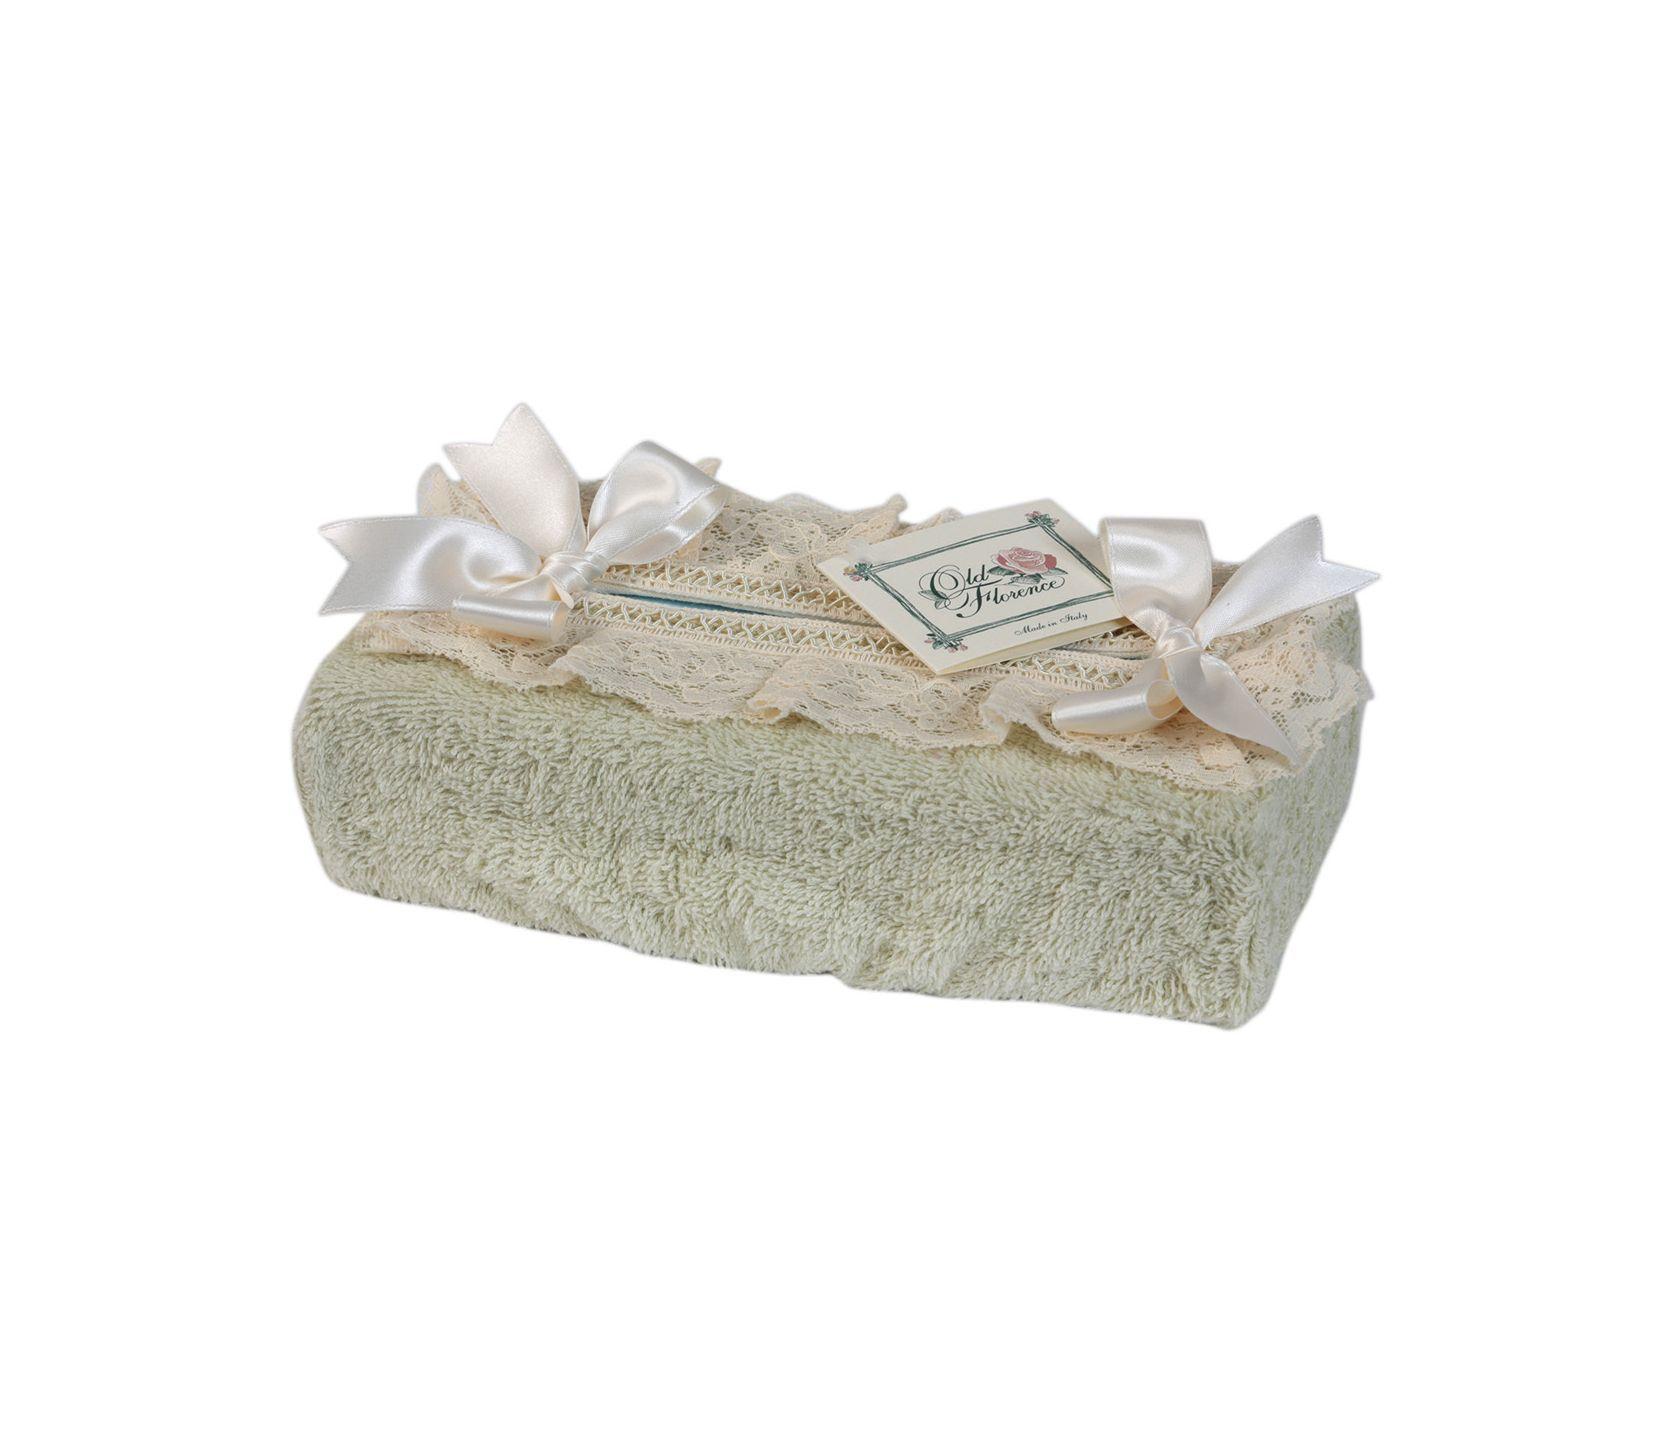 Салфетница для бумажных полотенец Валансье зеленая от Old Florence